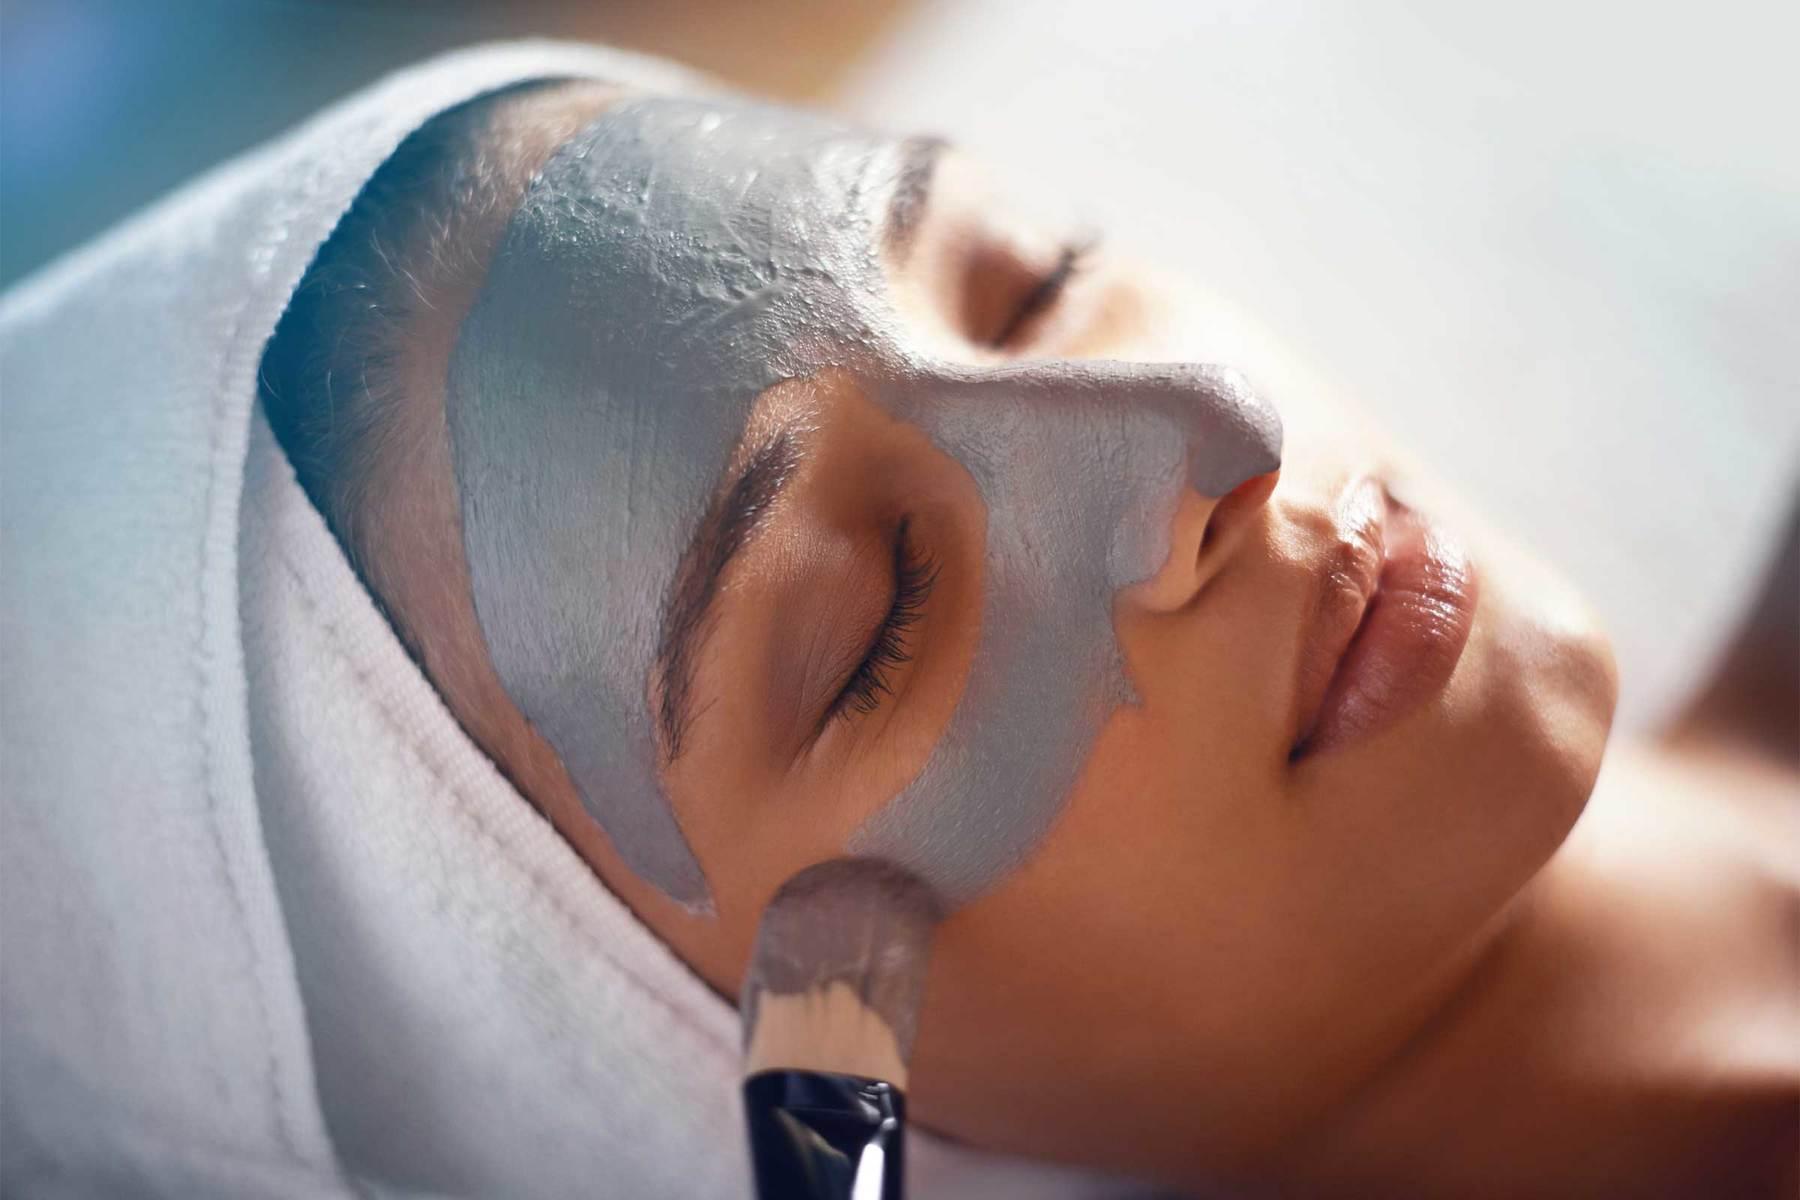 A woman in Dallas recieving a luxurious facial treatment